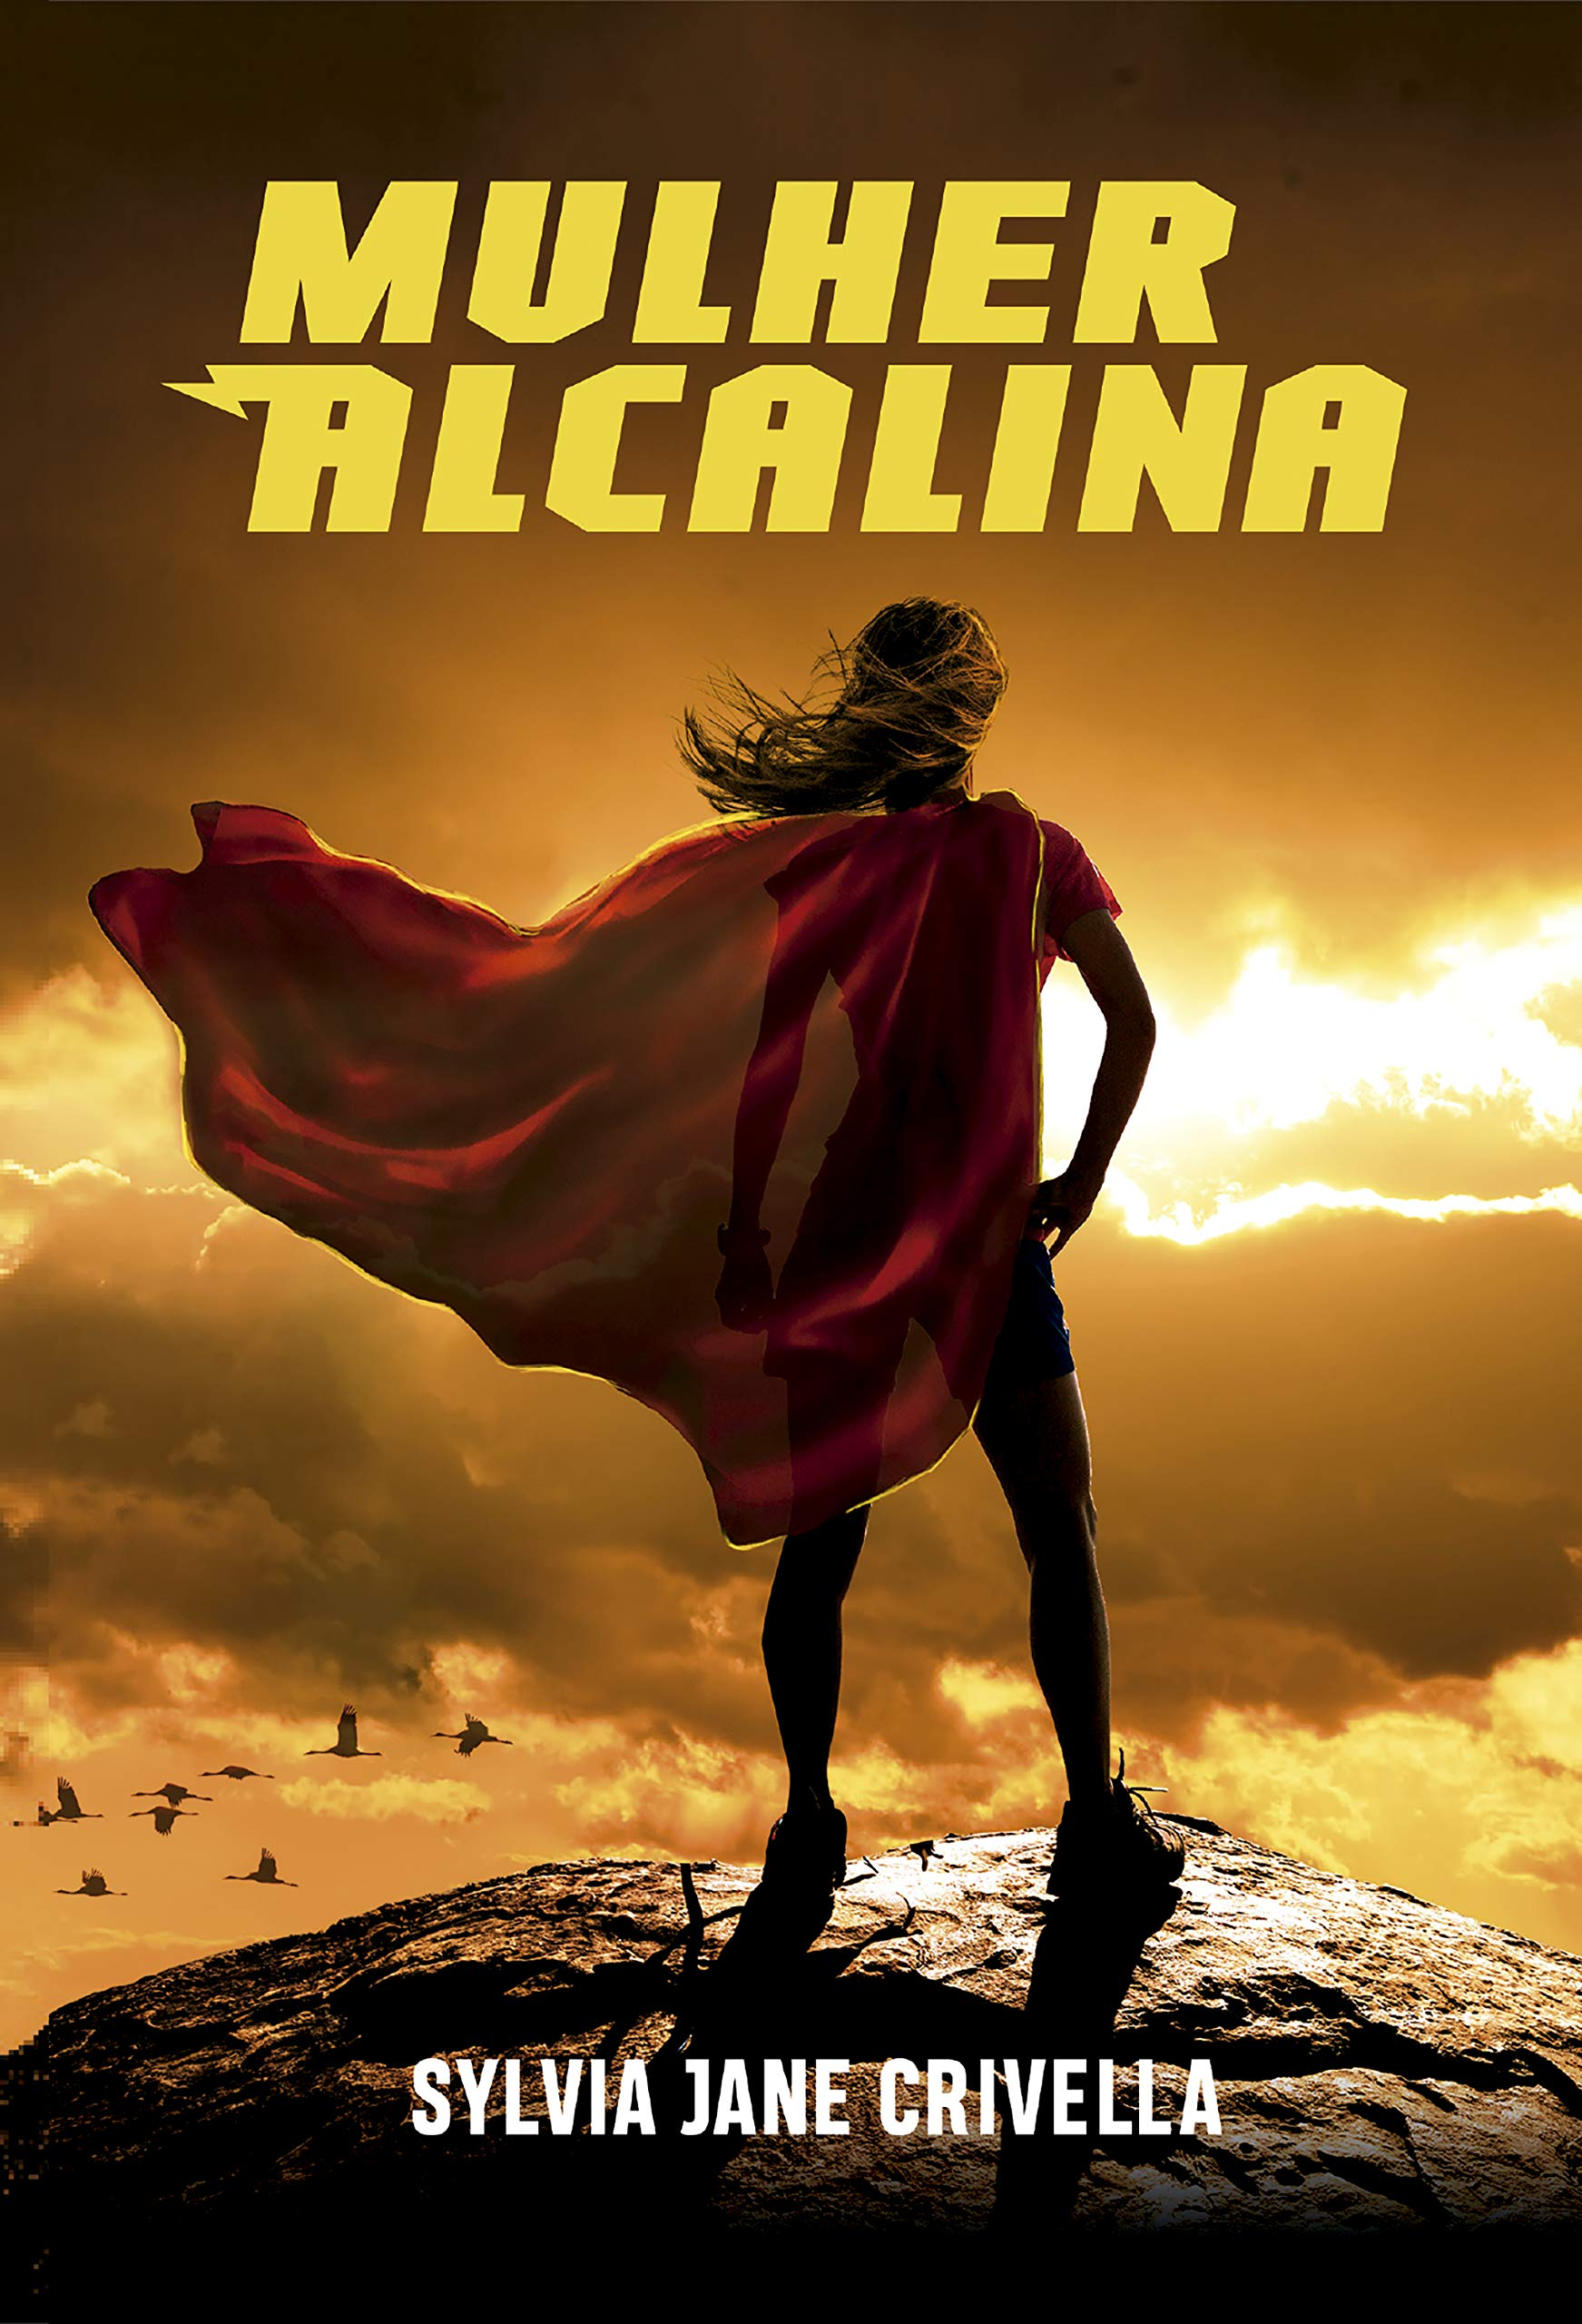 Mulher Alcalina Sylvia Jane Crivella